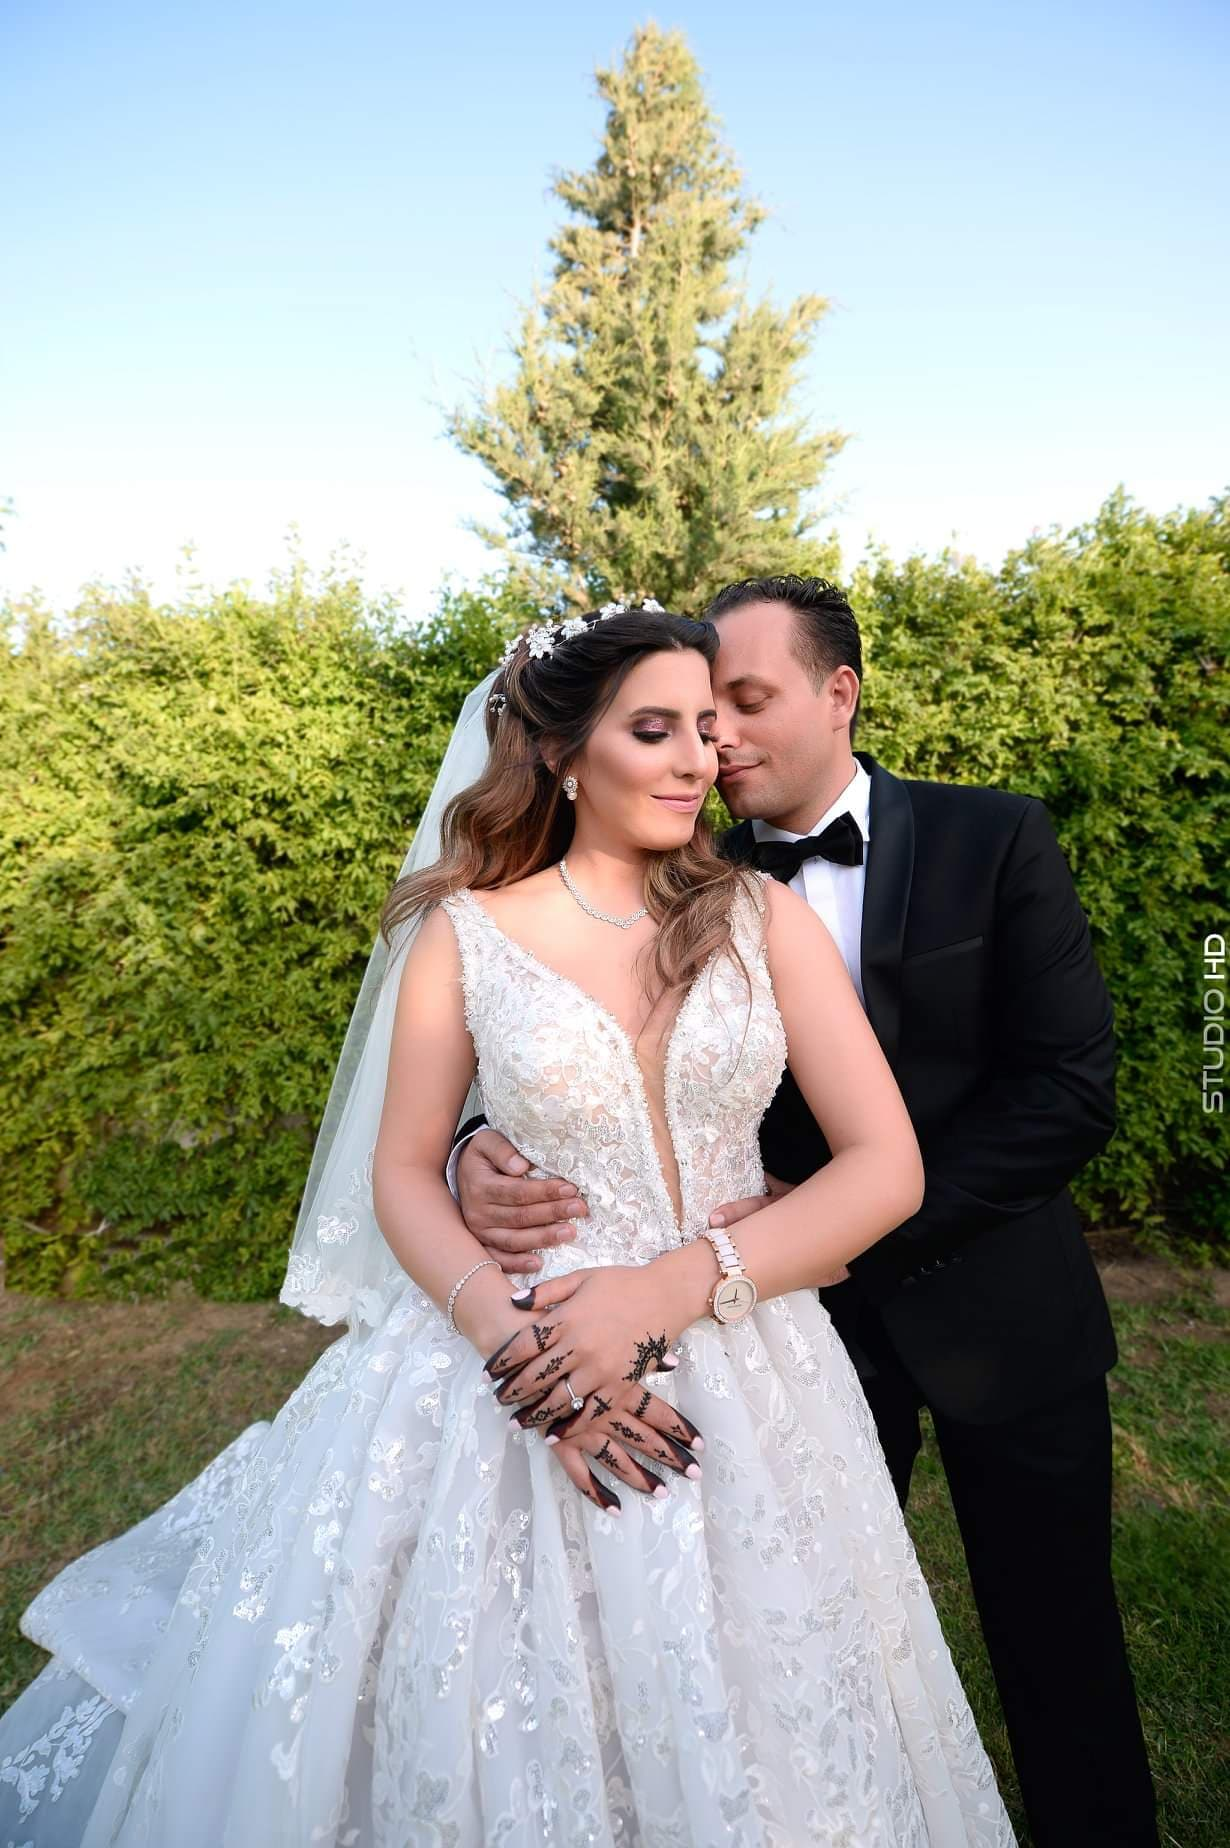 asma2_plus_belles_mariées_tunisiennes_159_2019